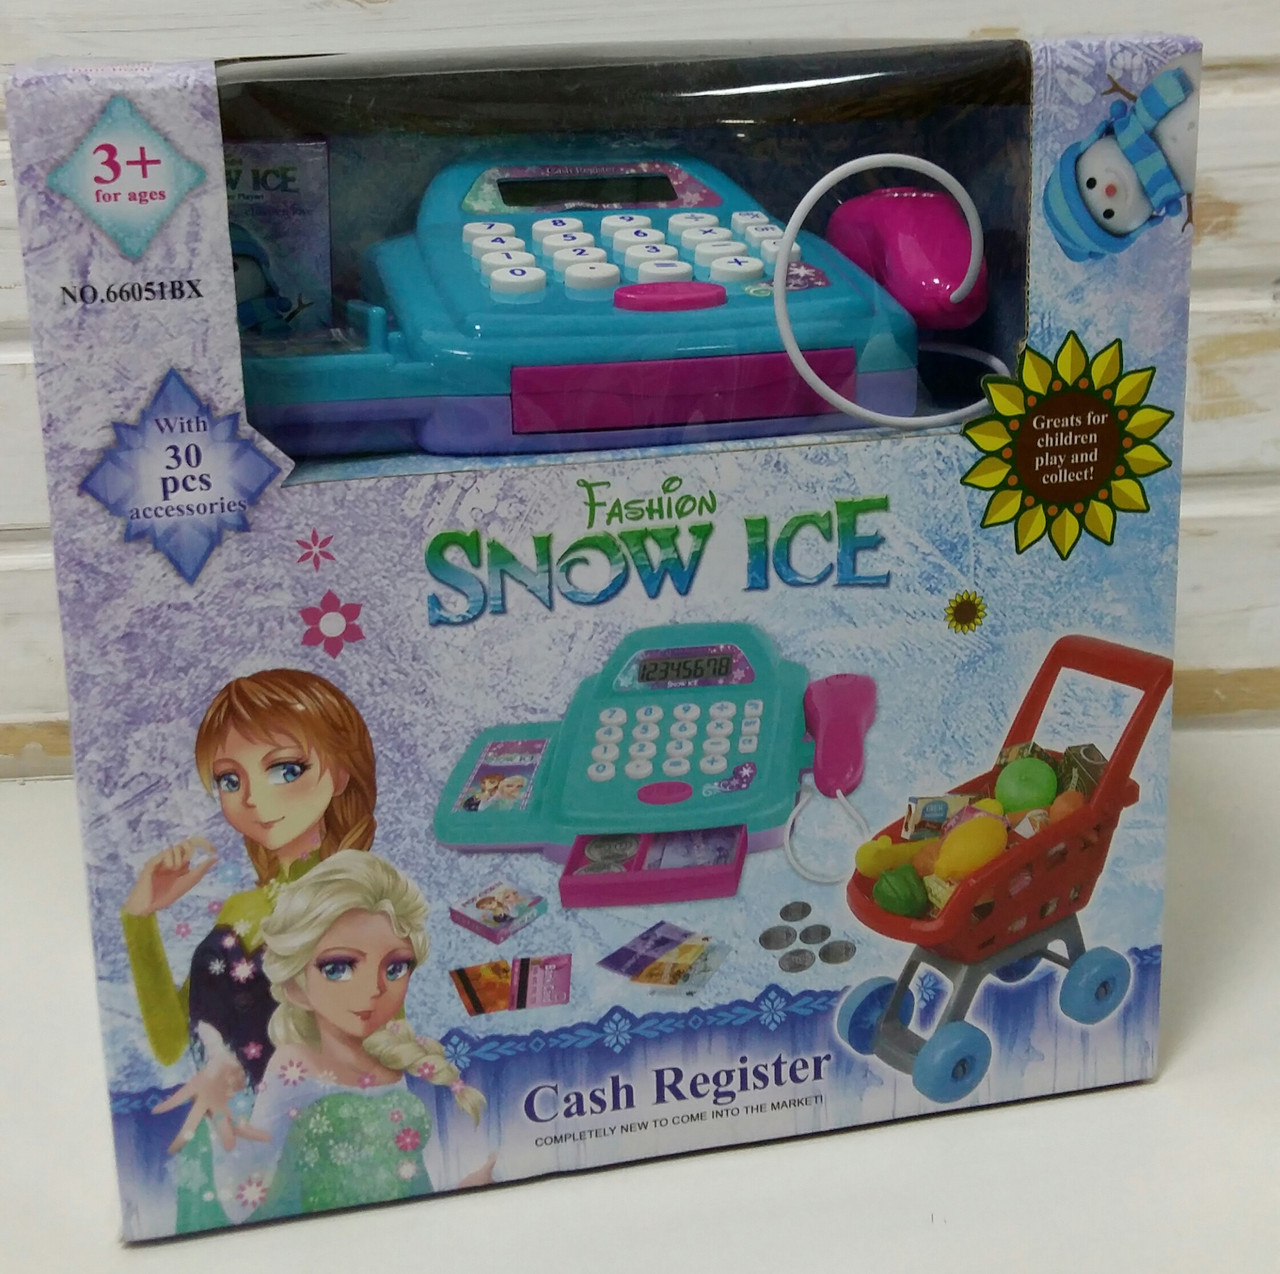 "Кассовый аппарат ""Snow Ice"" 66051 ВХ"